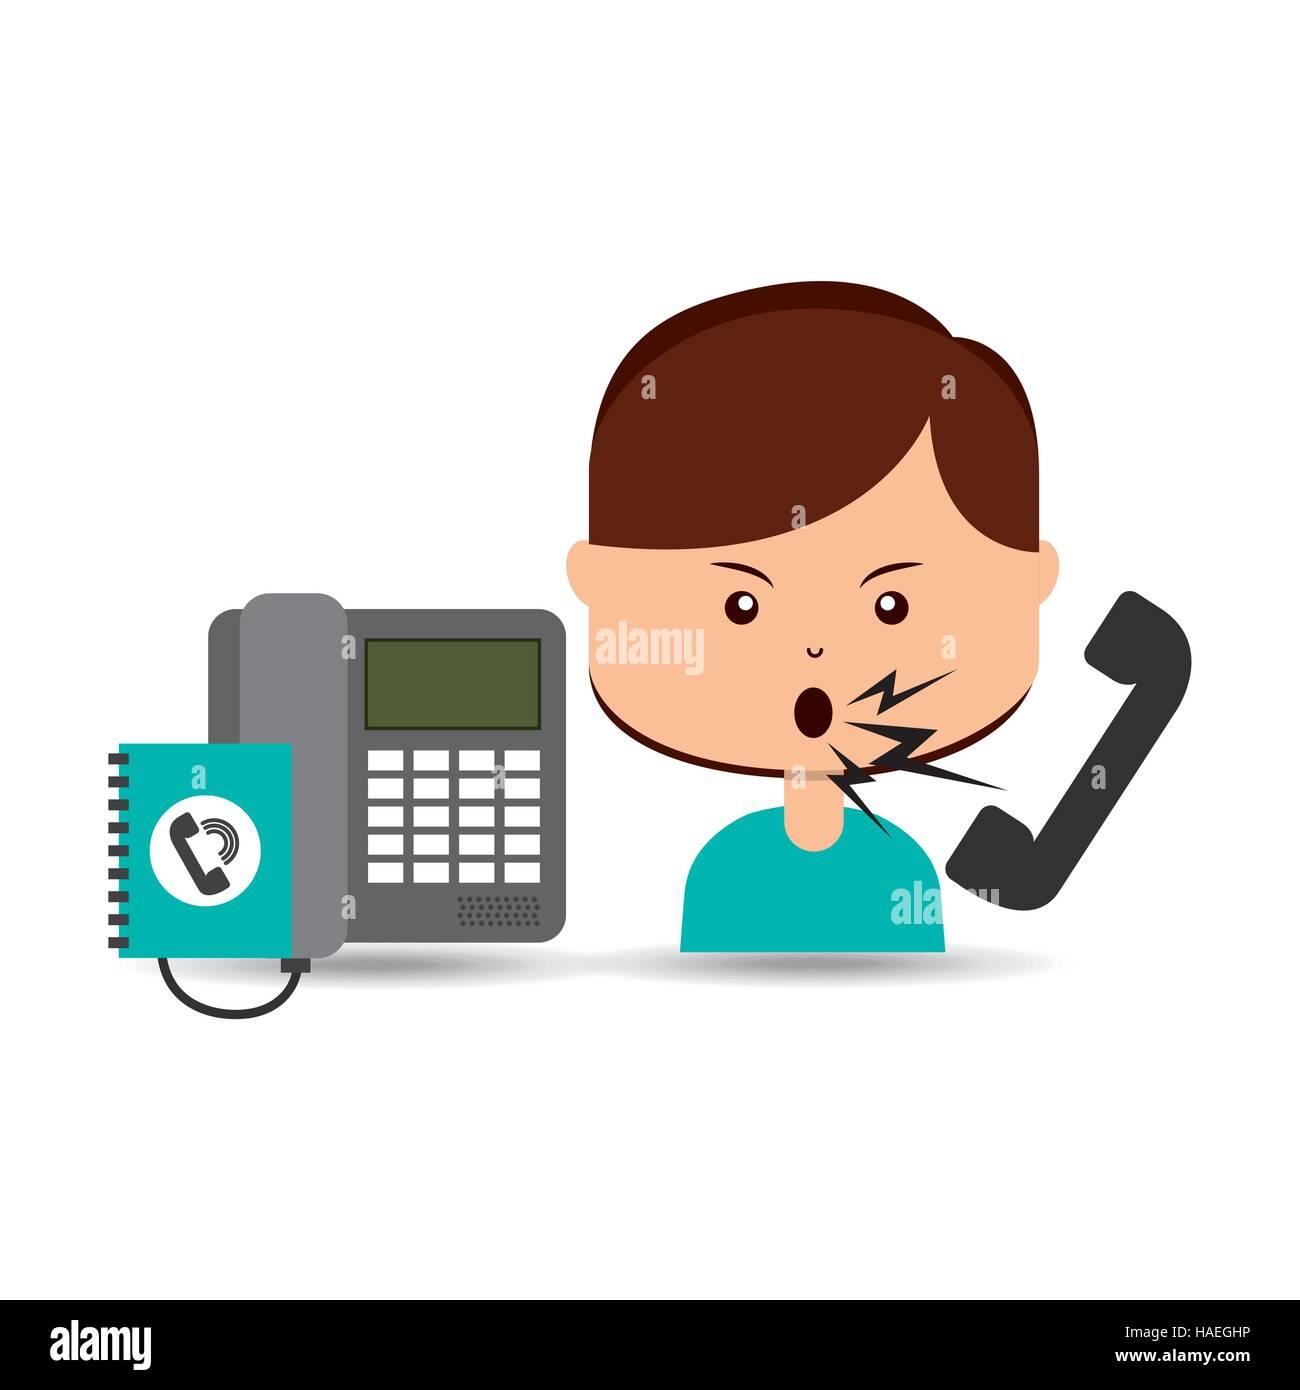 woman customer complaints call center vector illustration eps 10 - Stock Image